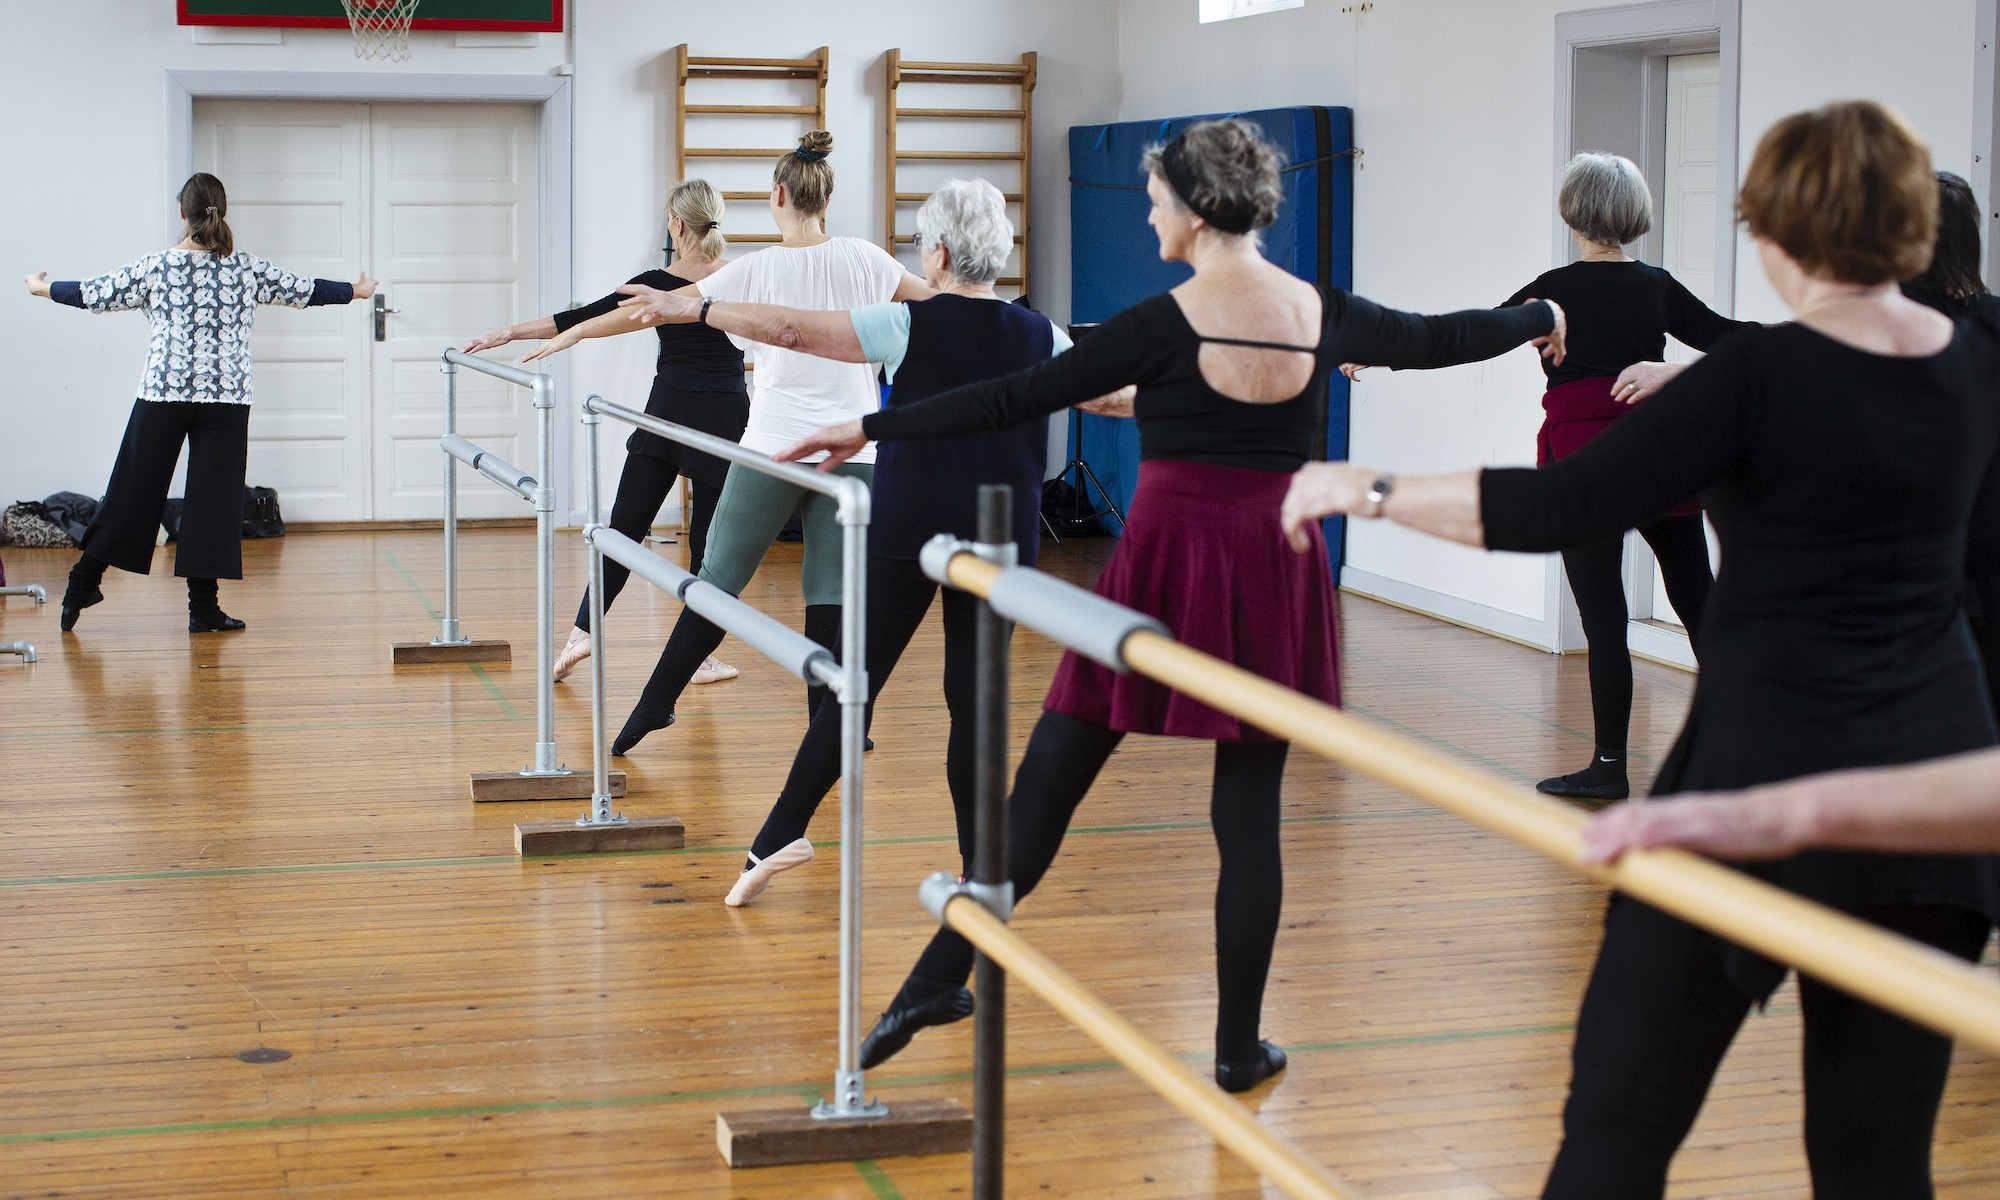 Balletfitness